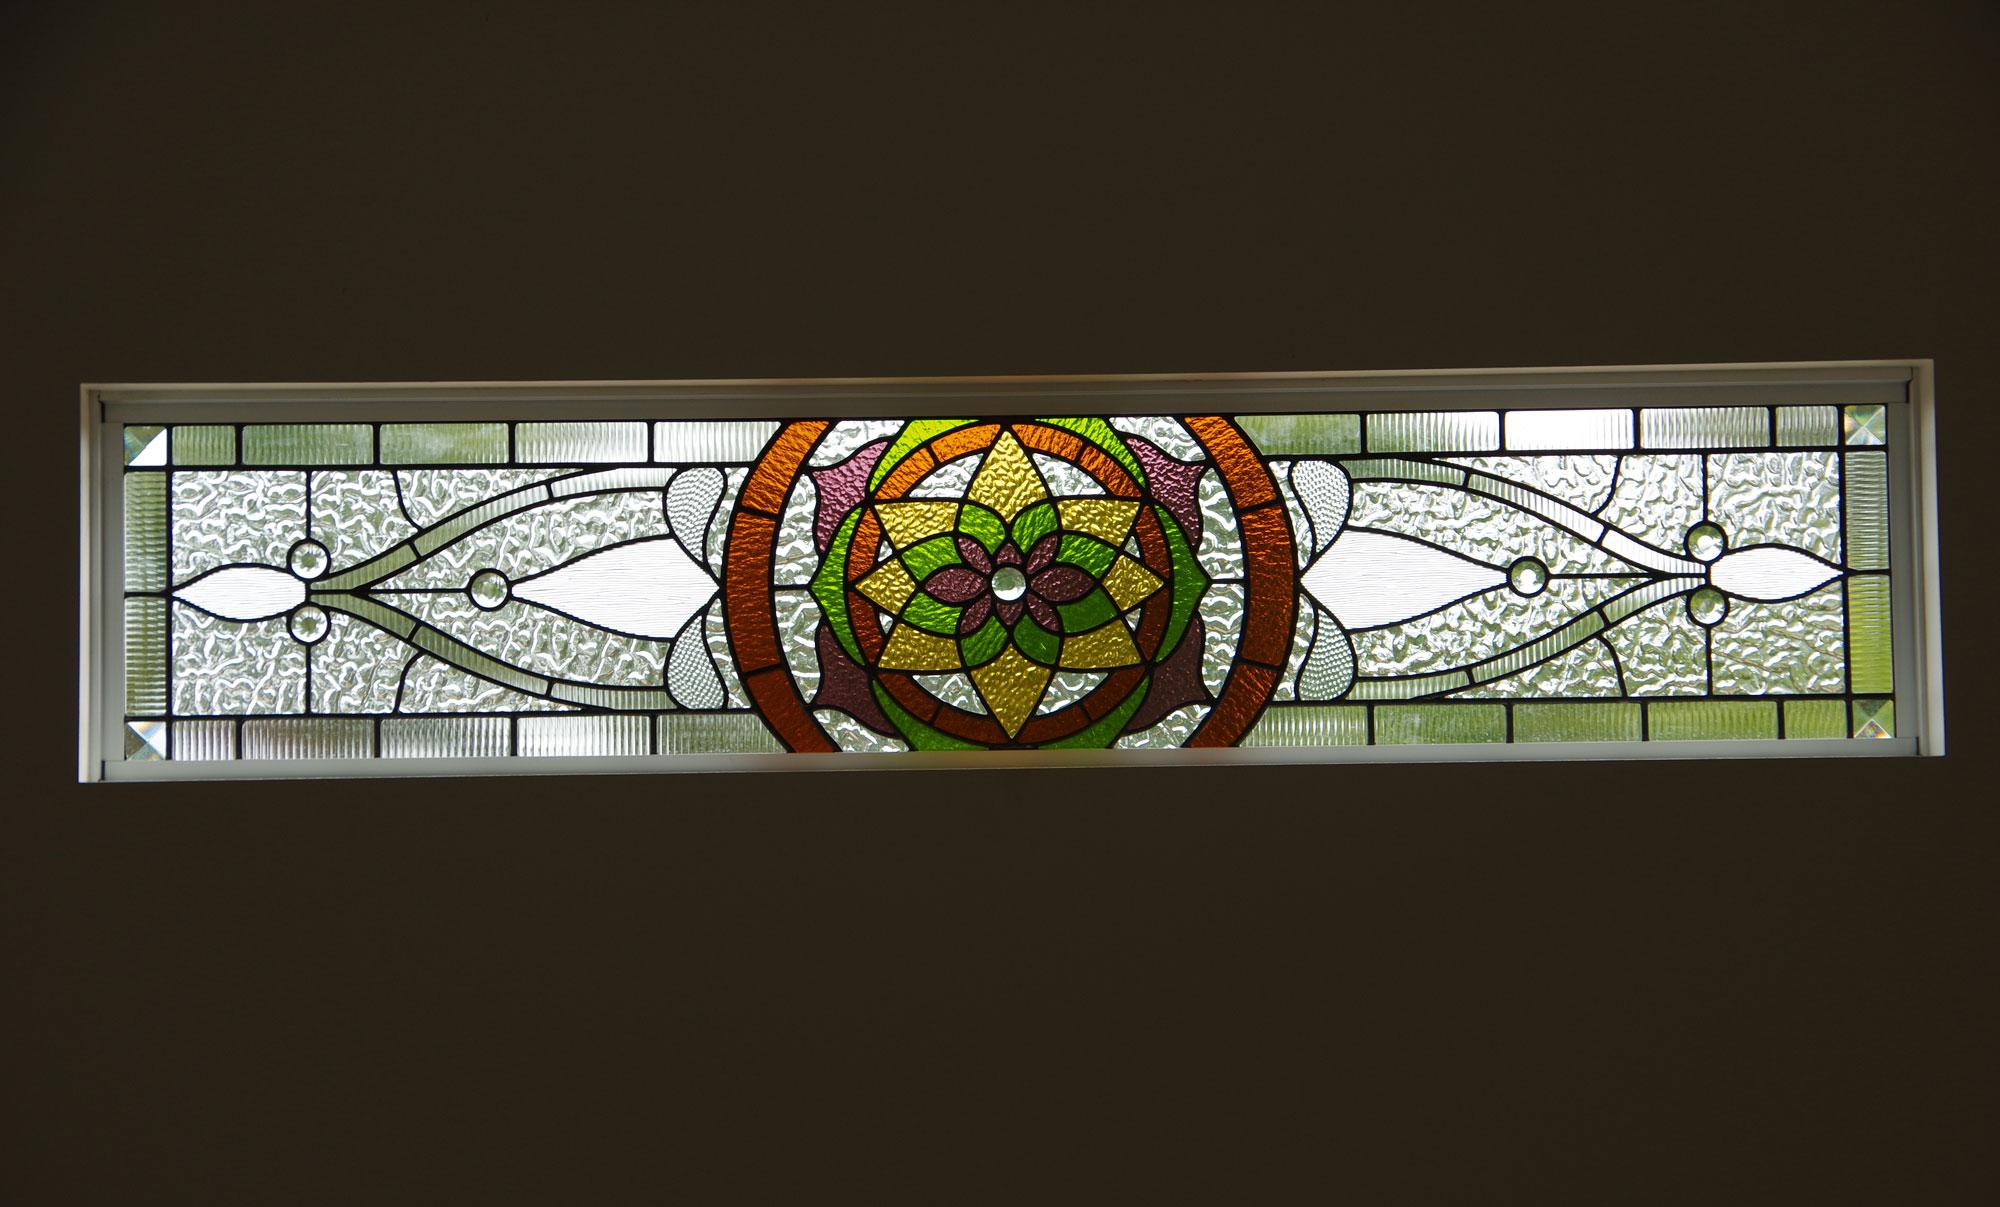 mandala stained glass